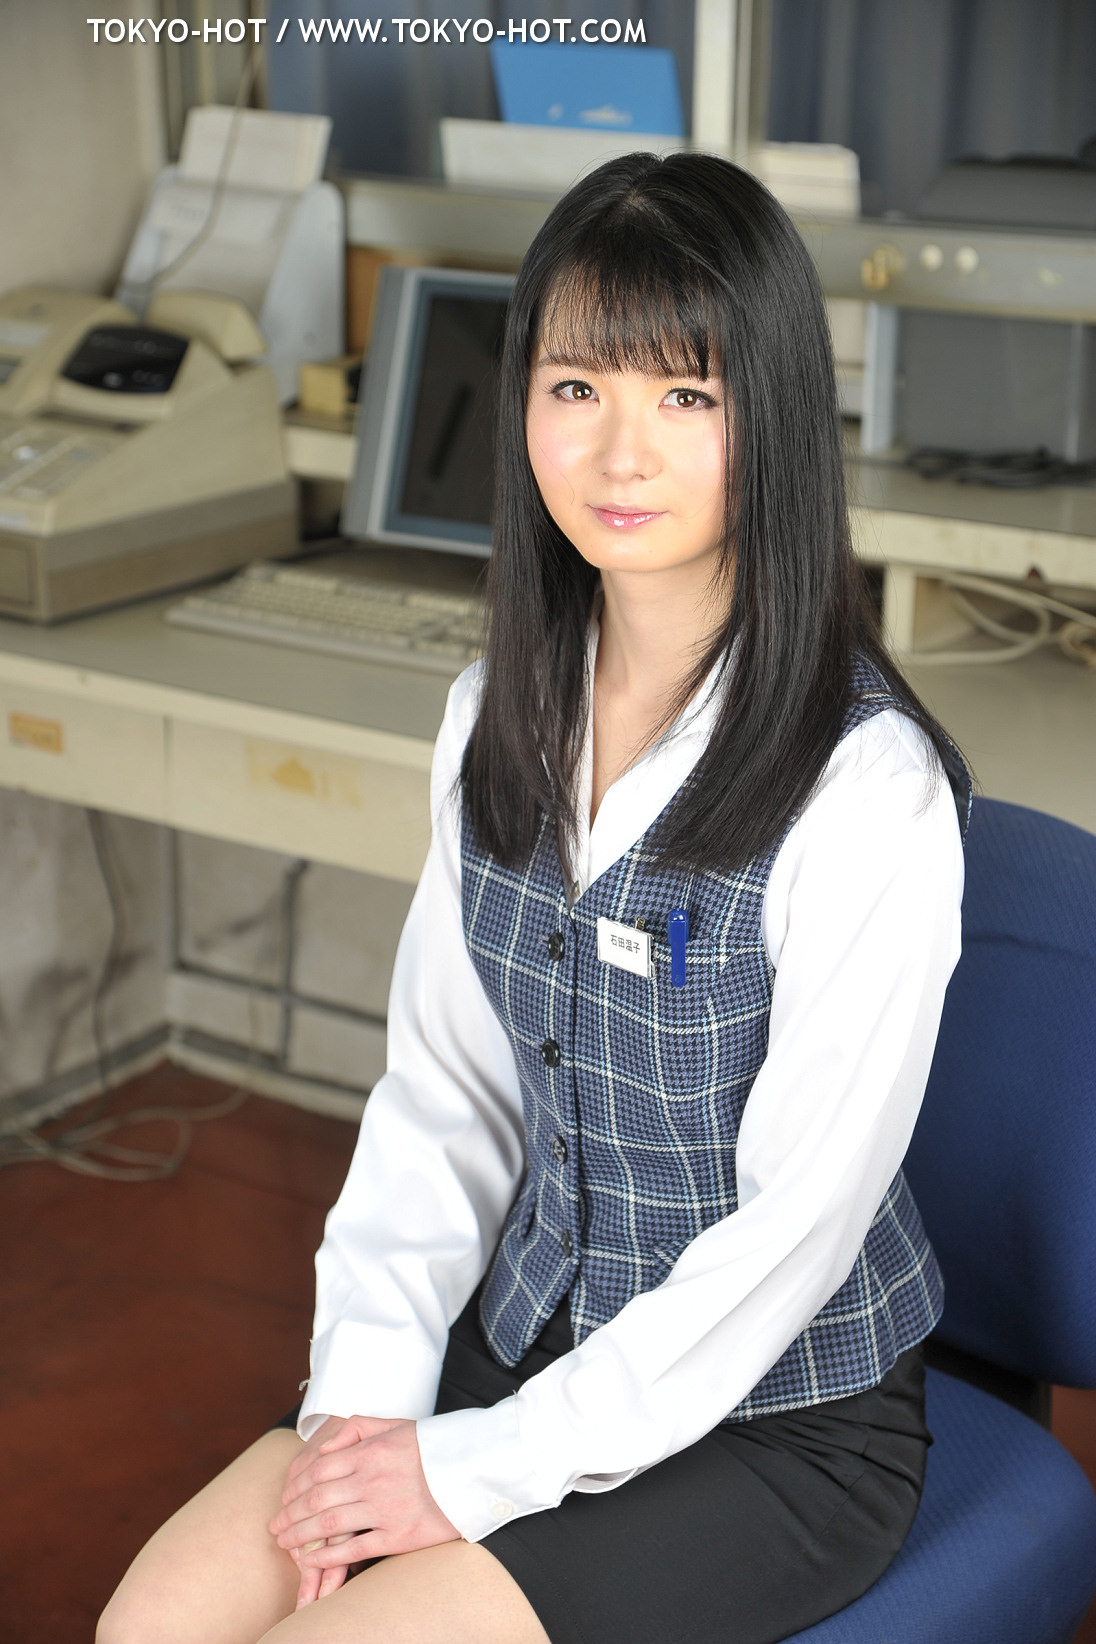 [Tokyo-Hot] 2017-01-14 e1064 Atsuko Ishida 石田温子 [479P250MB] - idols